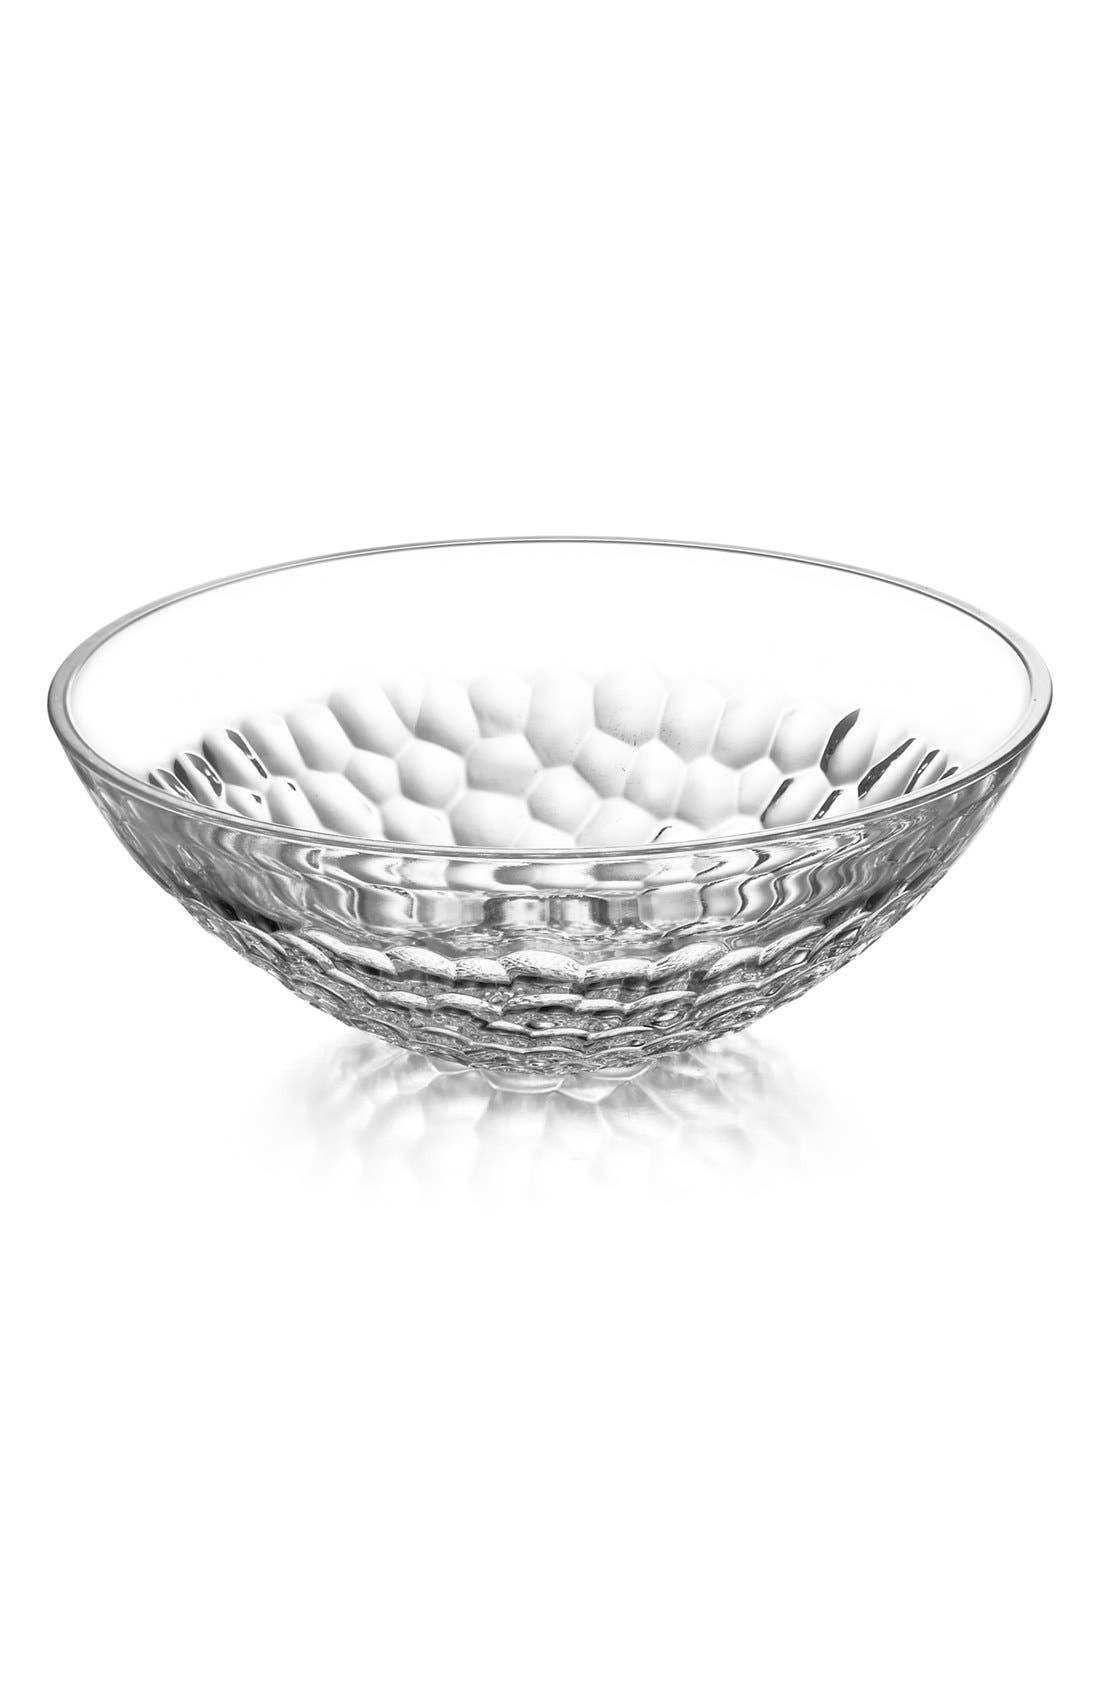 Orrefors 'Pearl' Lead Crystal Serving Bowl